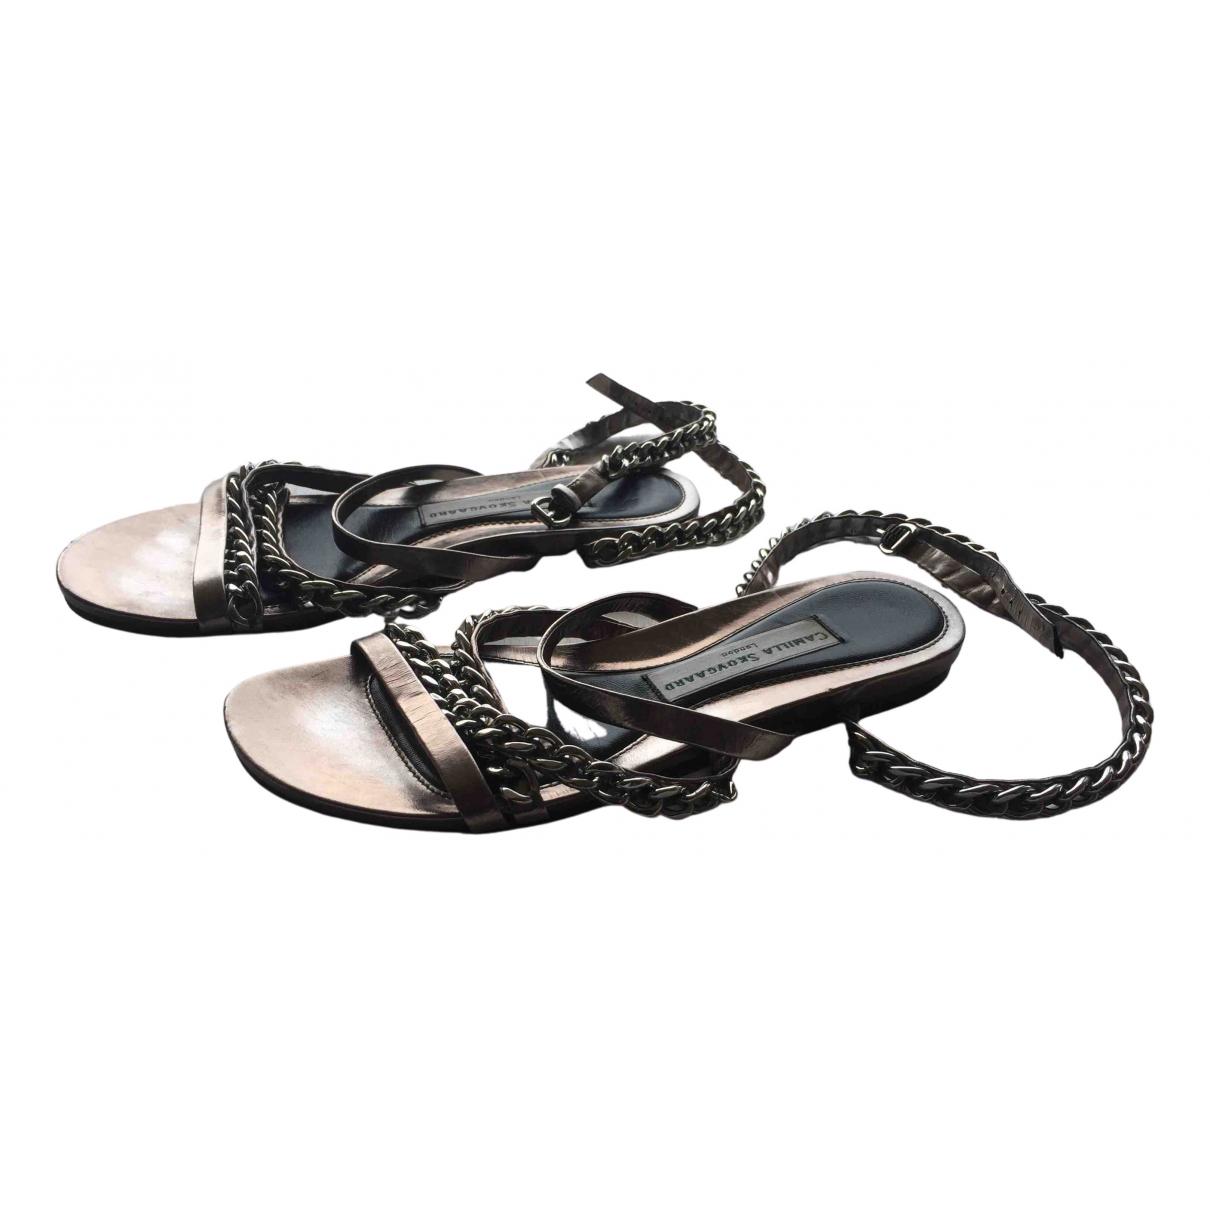 Sandalias de Cuero Camilla Skovgaard